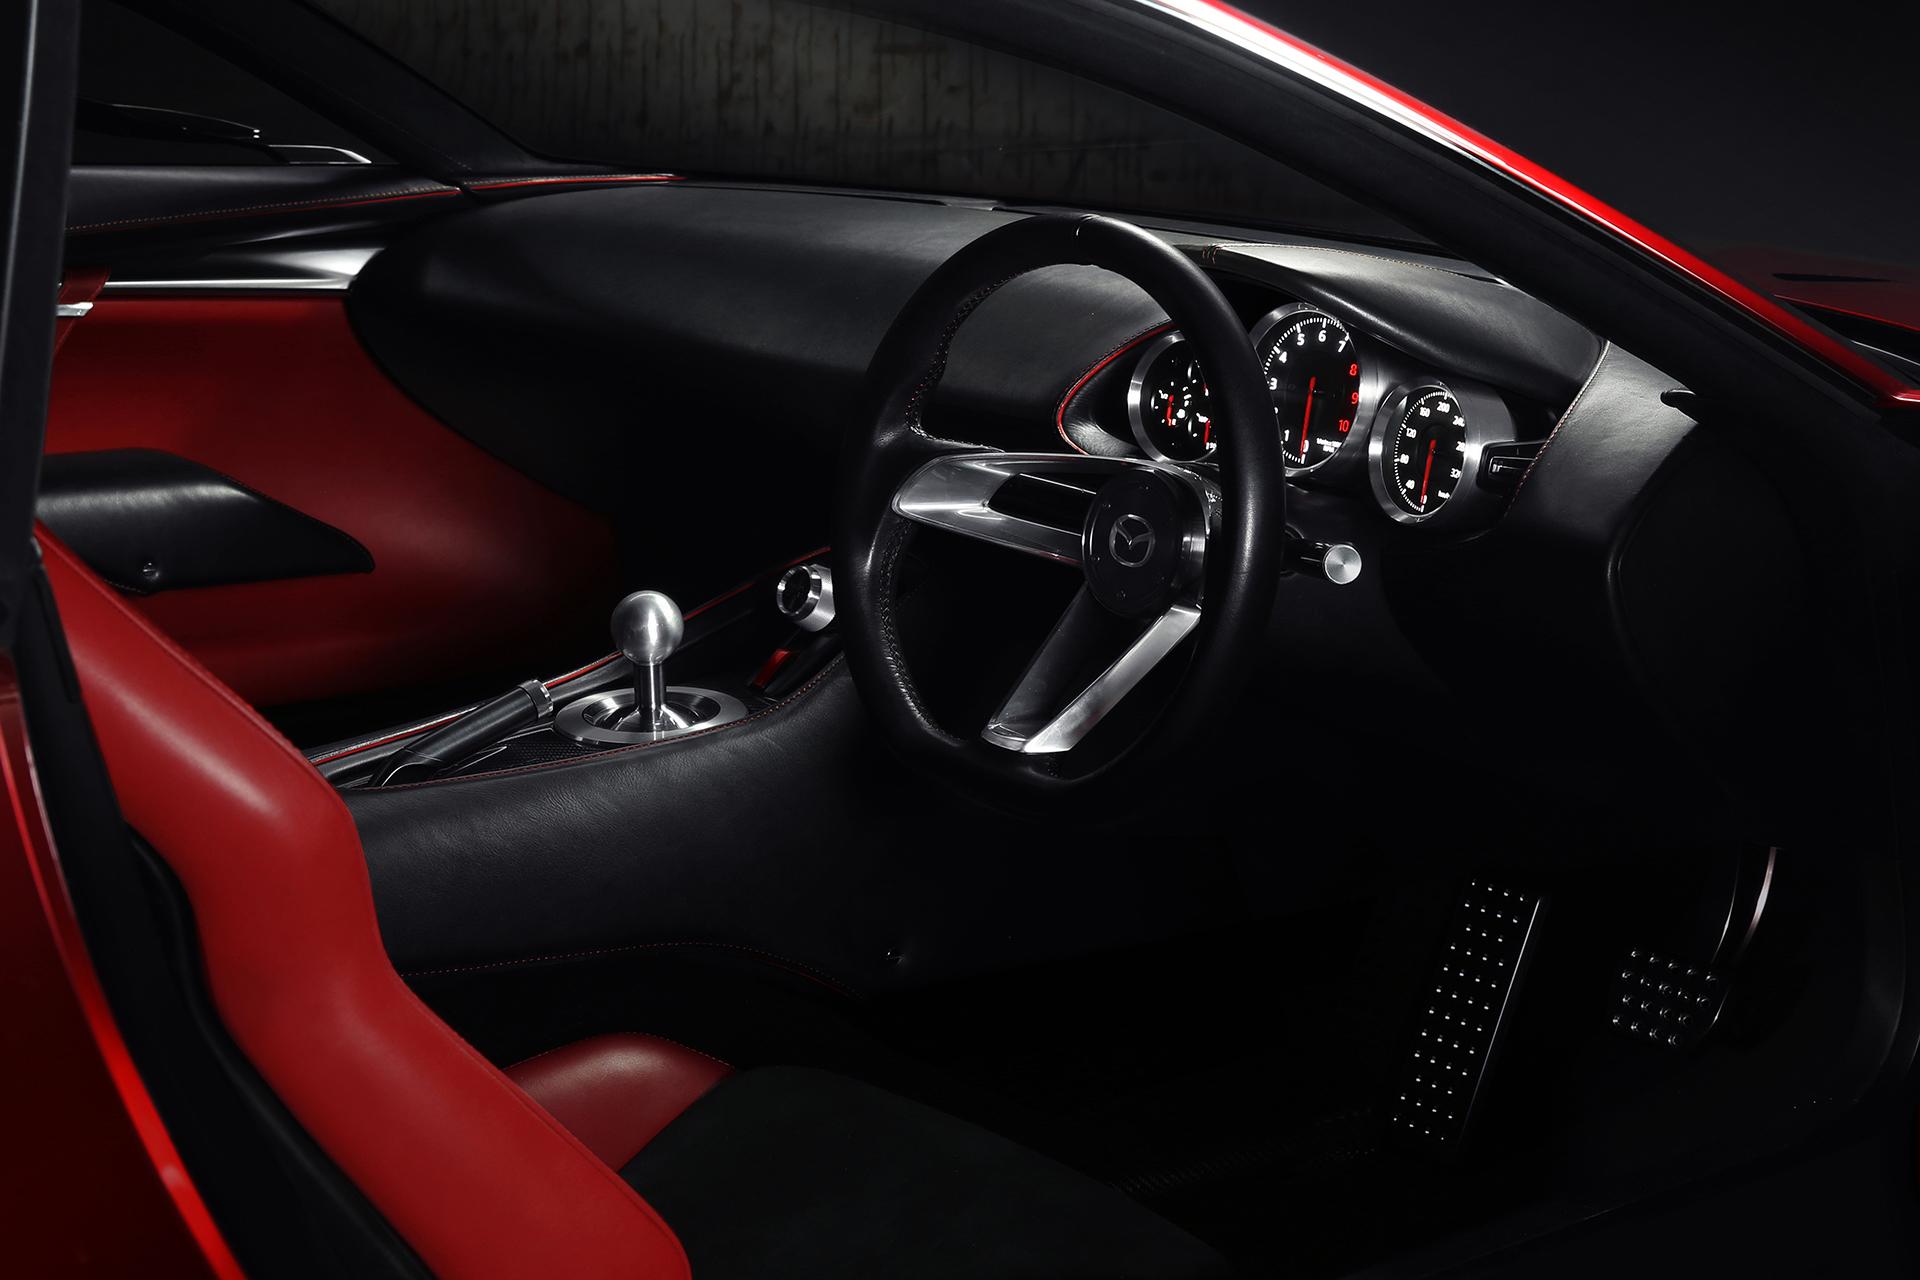 Mazda RX-VISION Concept - 2015 - intérieur / interior